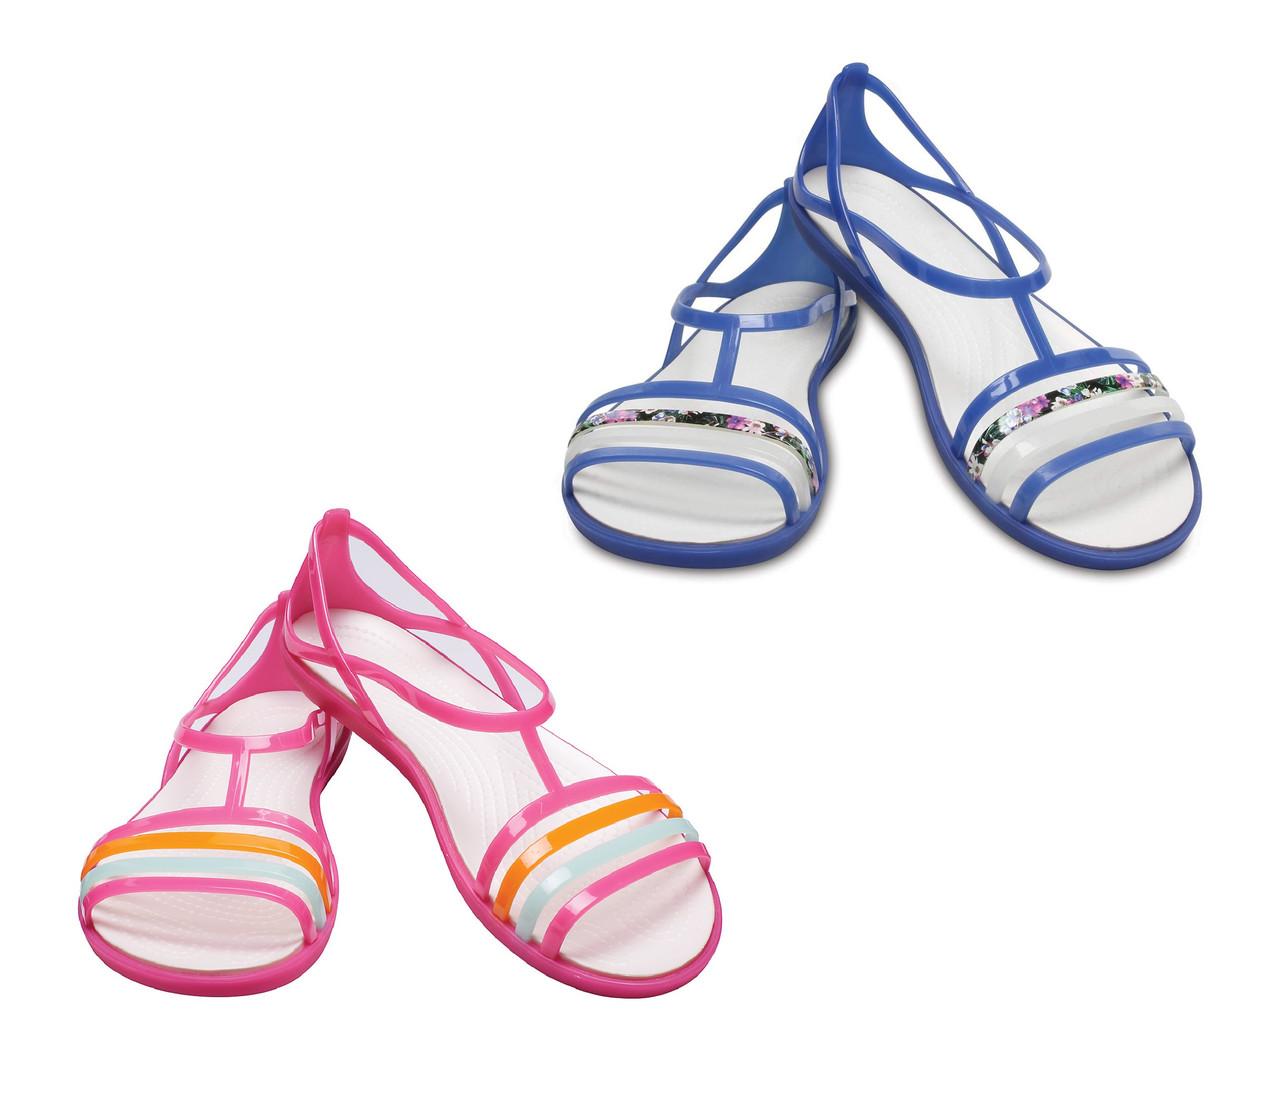 e516a7469b6b Босоножки женские балетки Кроксы Изабелла оригинал / Crocs Women's Isabella  Sandal: продажа, ...